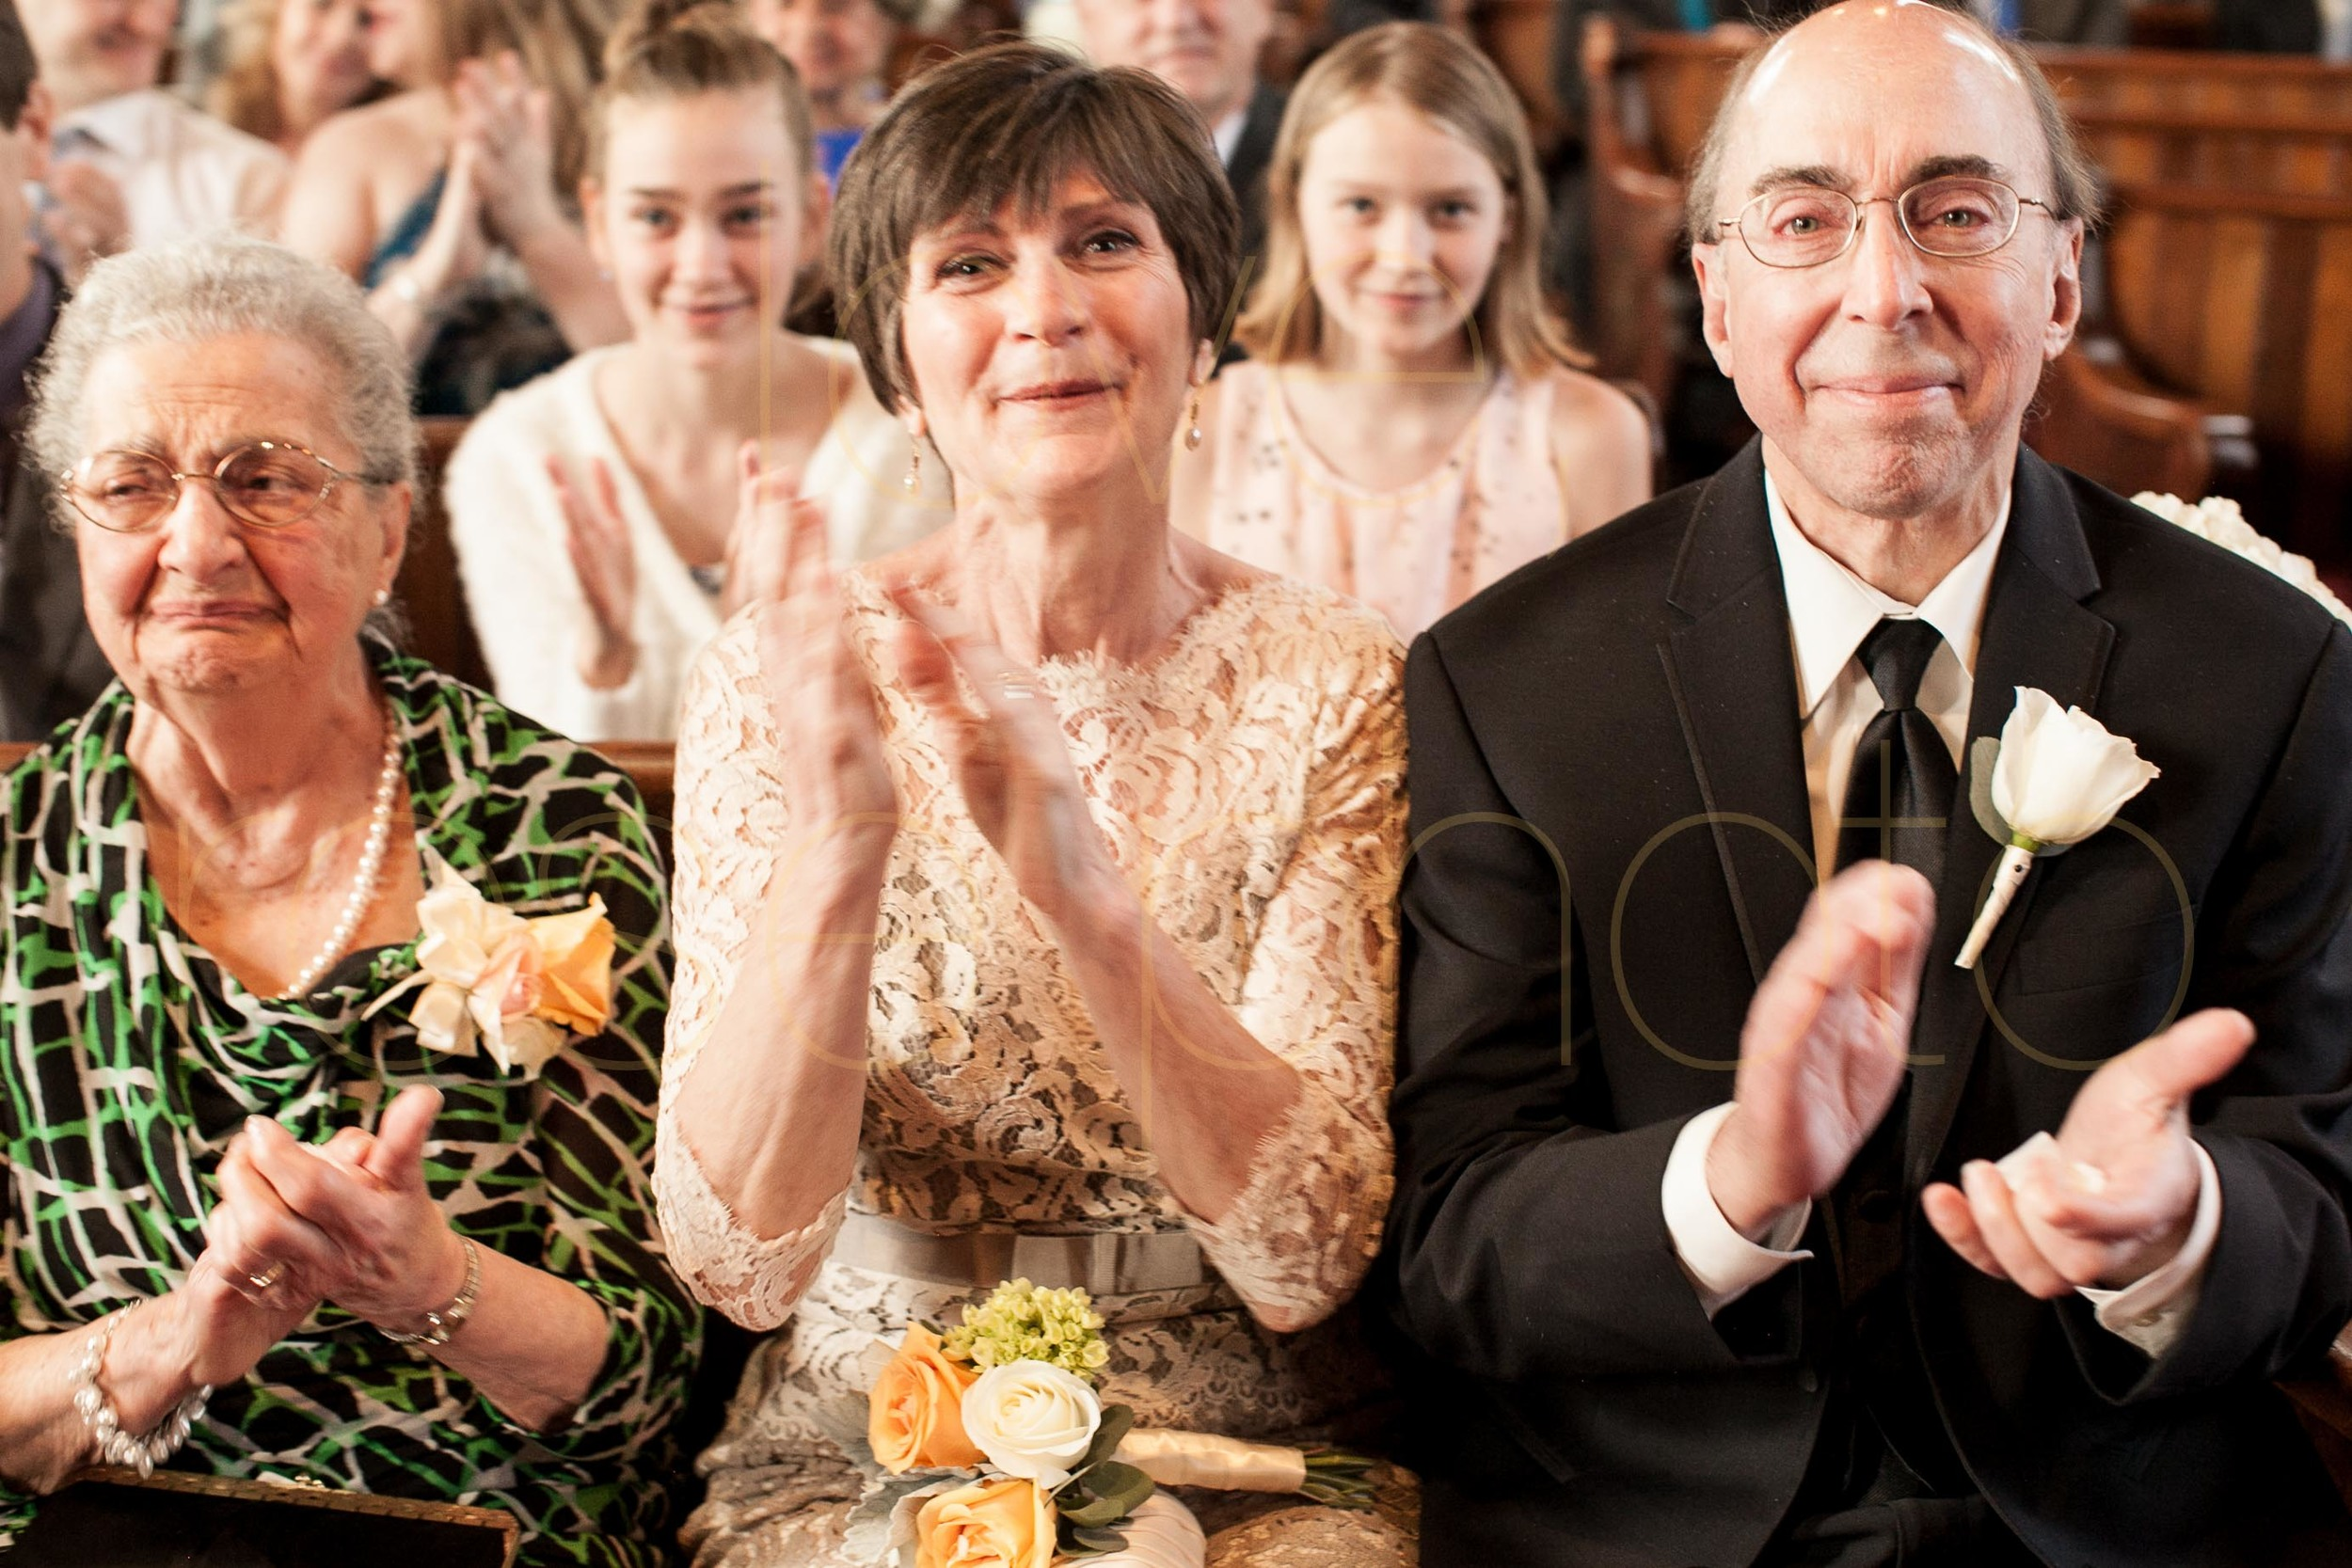 K Bianci maple chaple summer wedding chicago photographer -0181.jpg